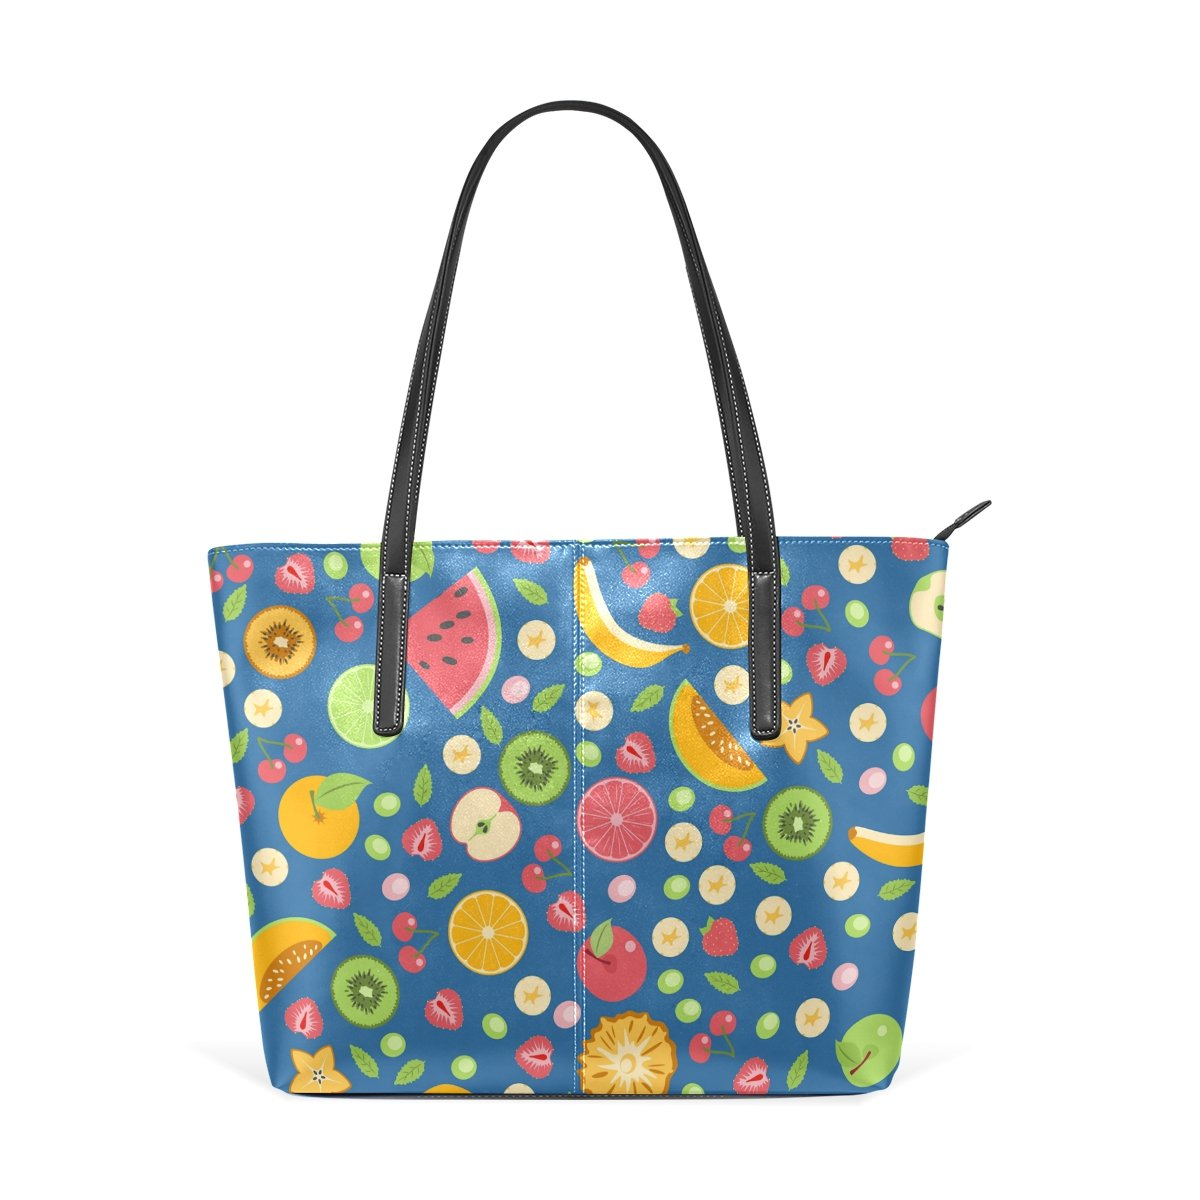 Women Leather Handbags Sweet Fruits Top Handle Shoulder Bags